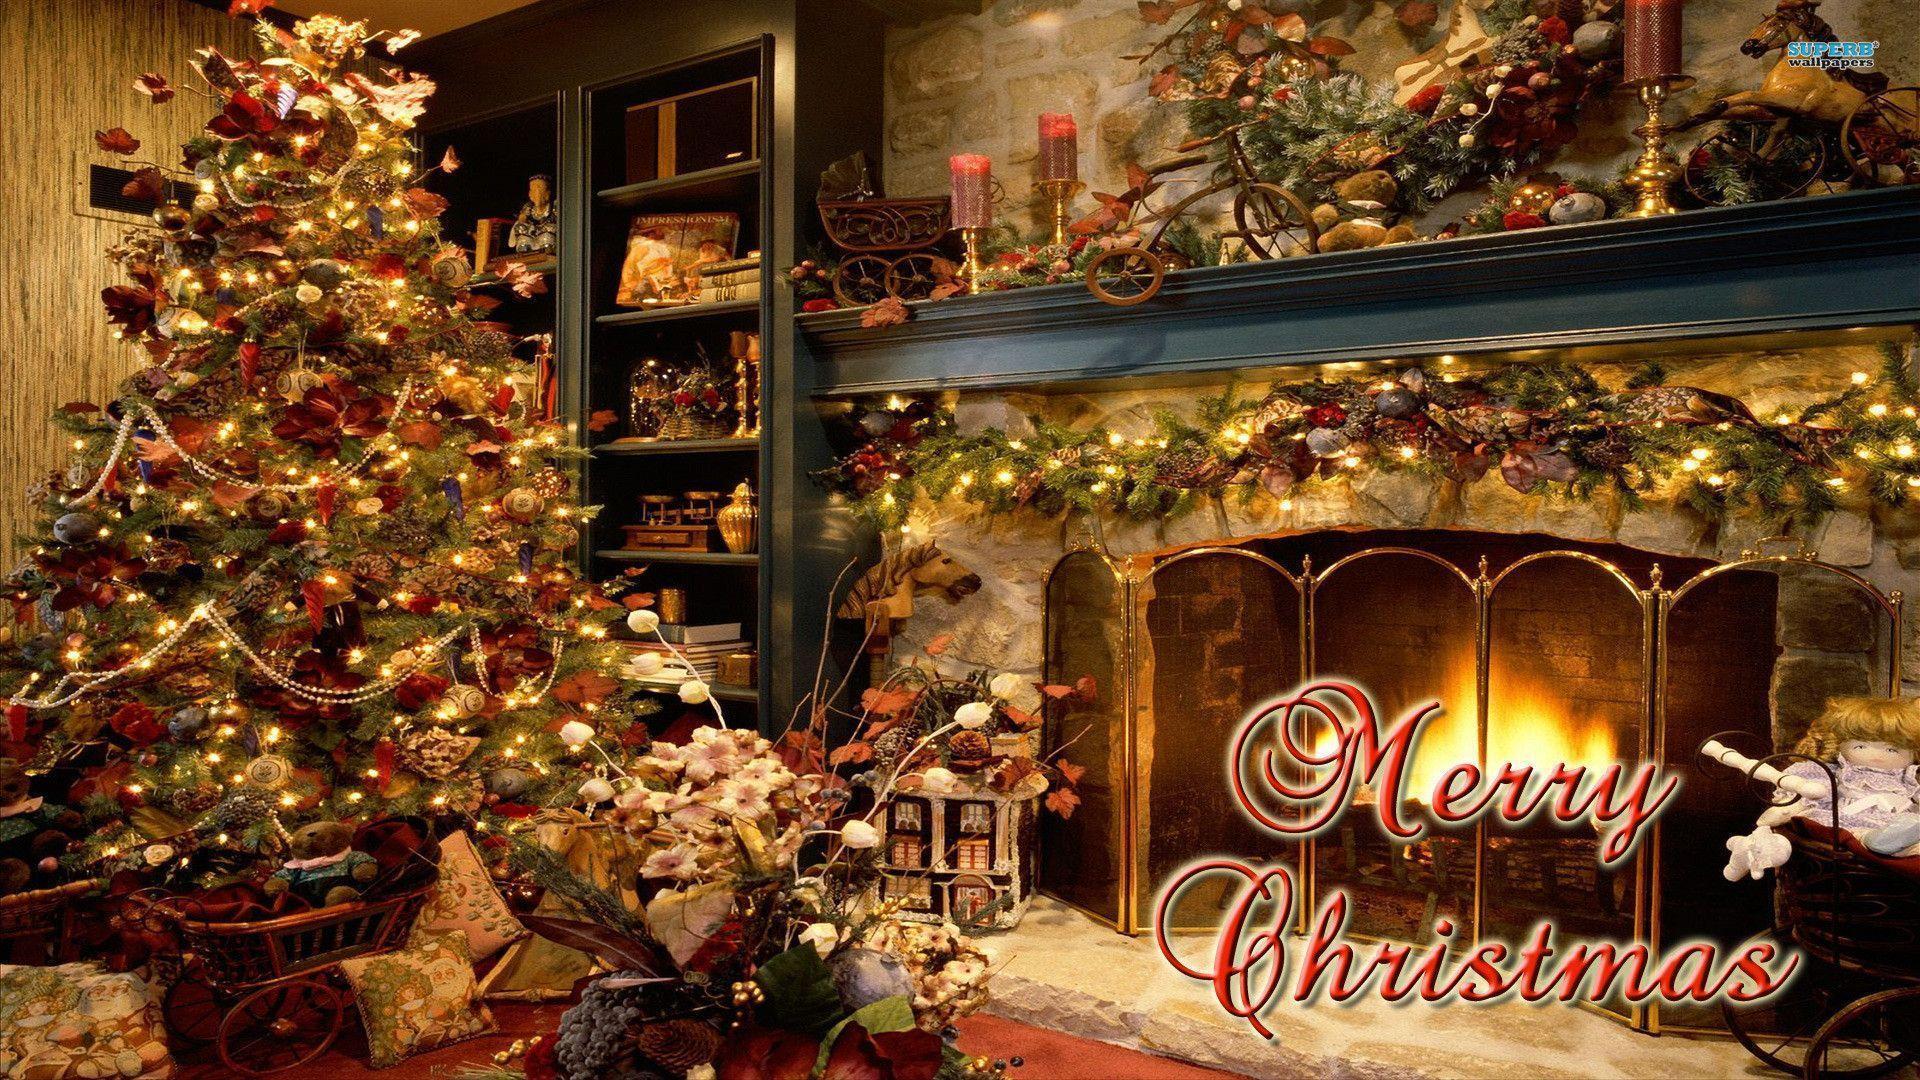 merry christmas hd wallpaper 2009